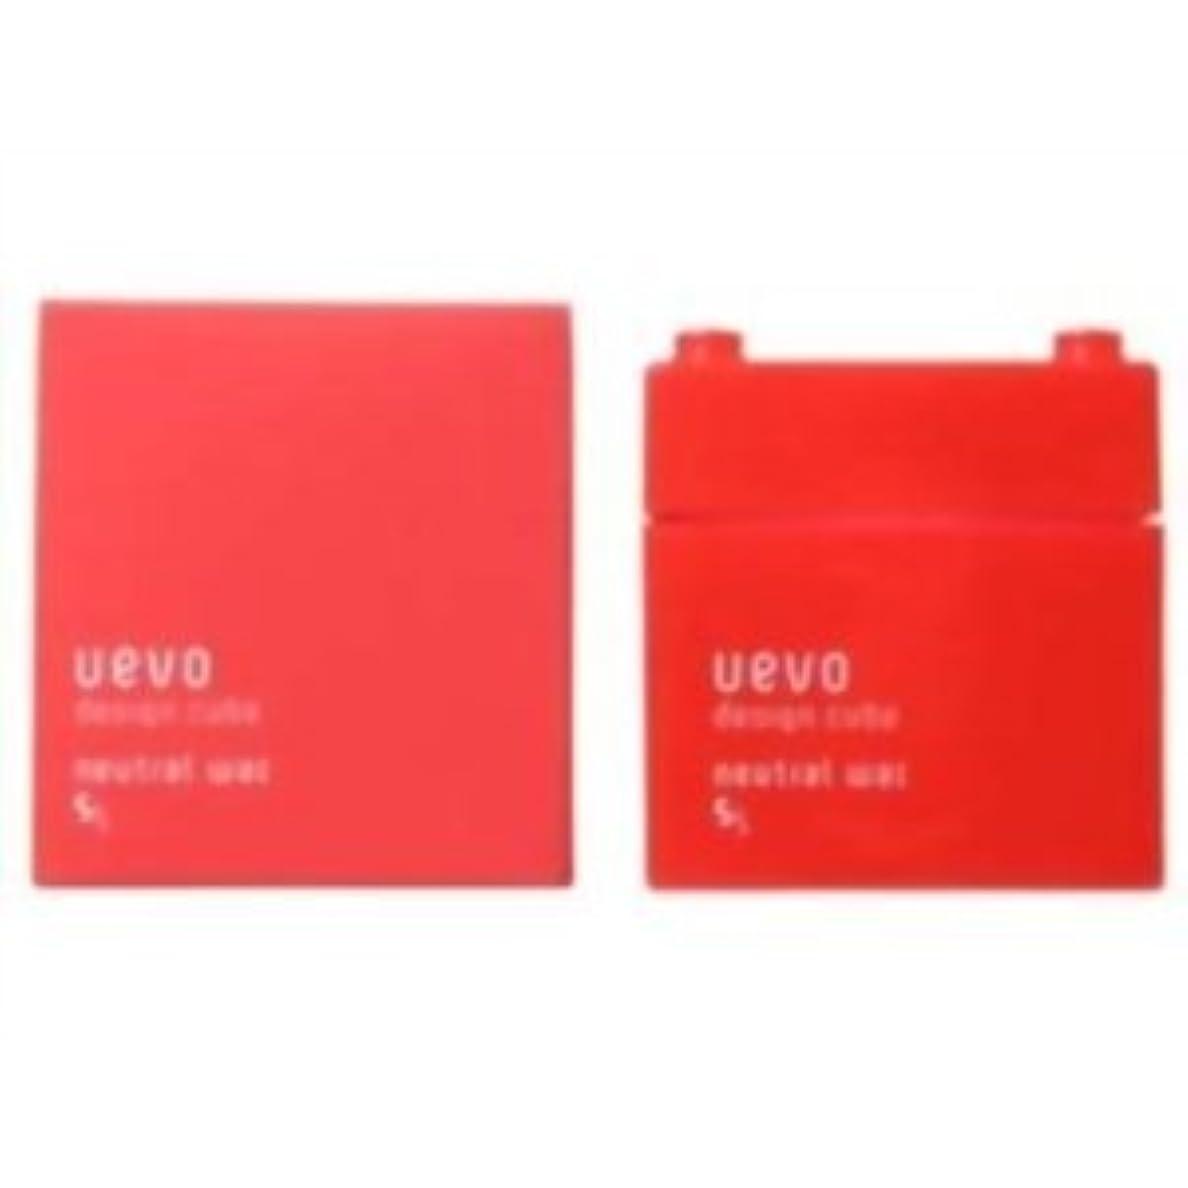 【X2個セット】 デミ ウェーボ デザインキューブ ニュートラルワックス 80g neutral wax DEMI uevo design cube